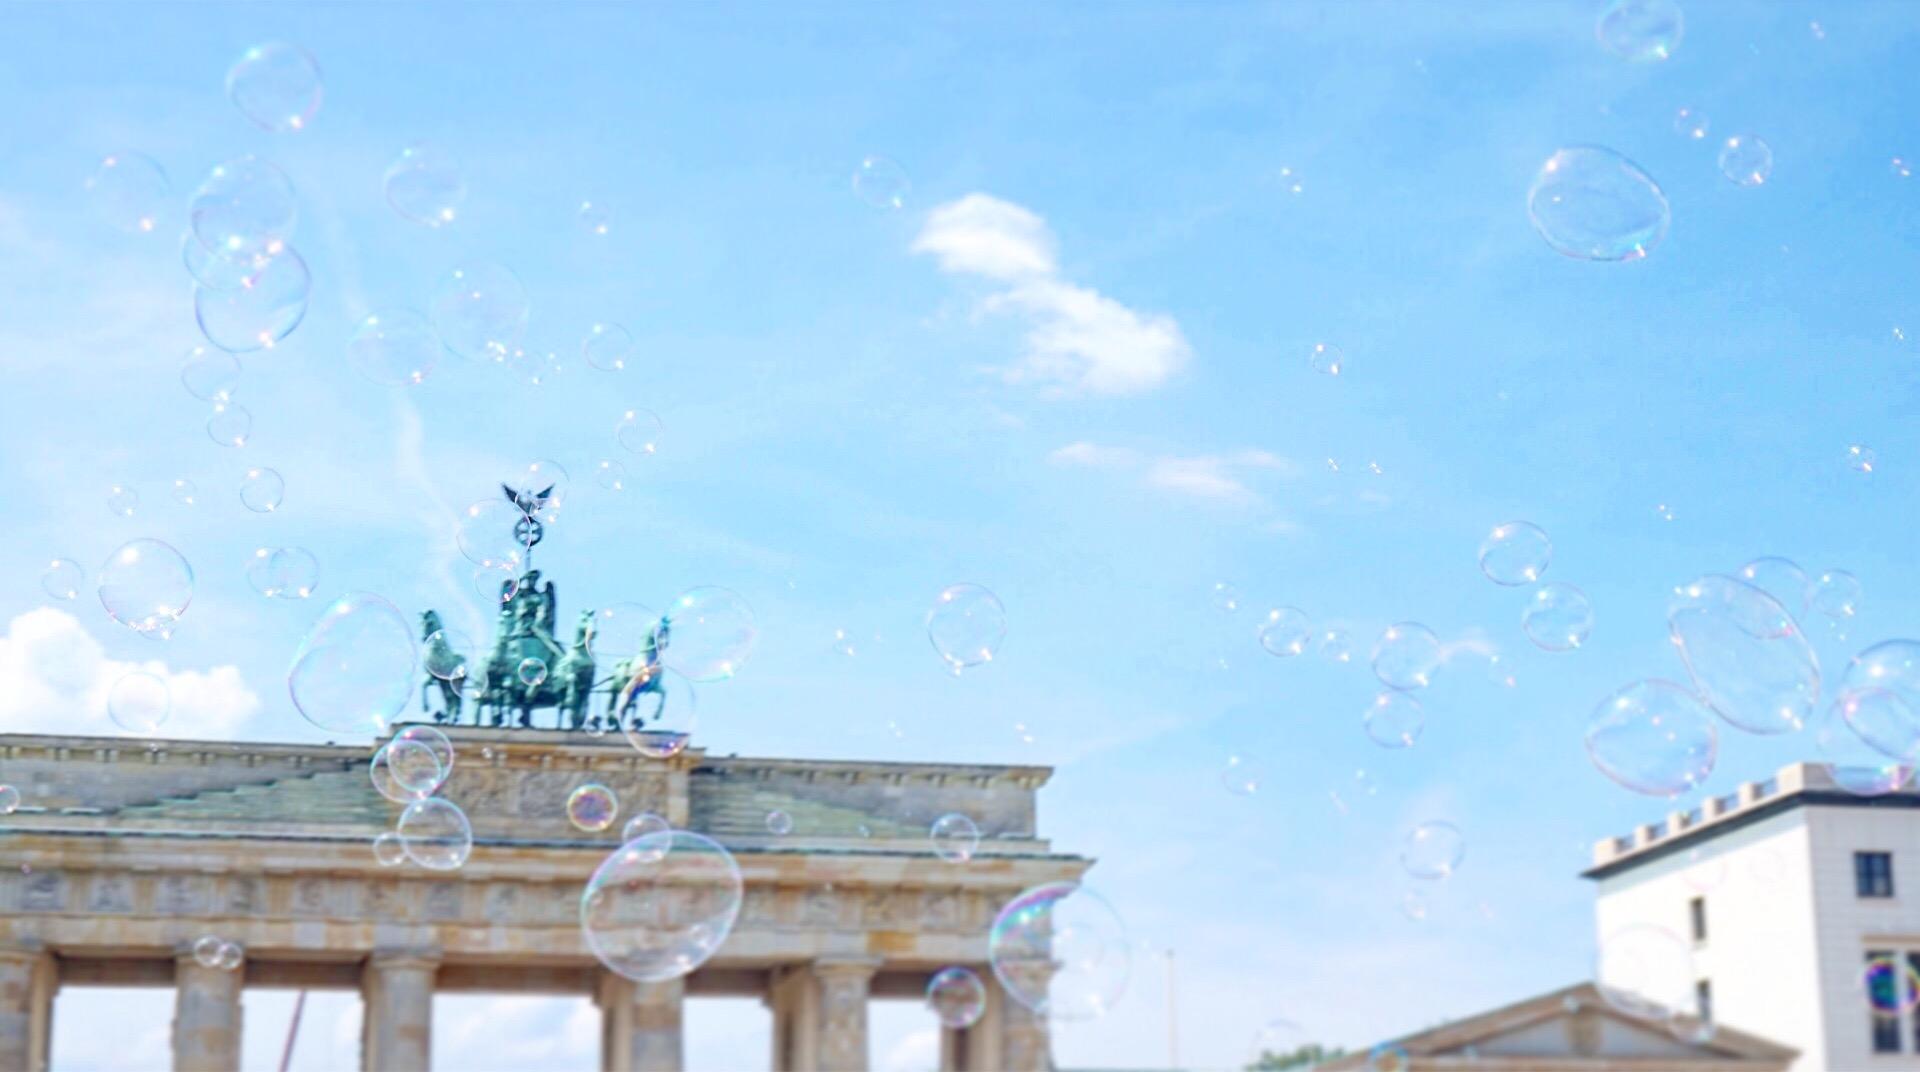 Brandenburger Tor / Brandenburg Gate, Pariser Platz, 10117, Berlin